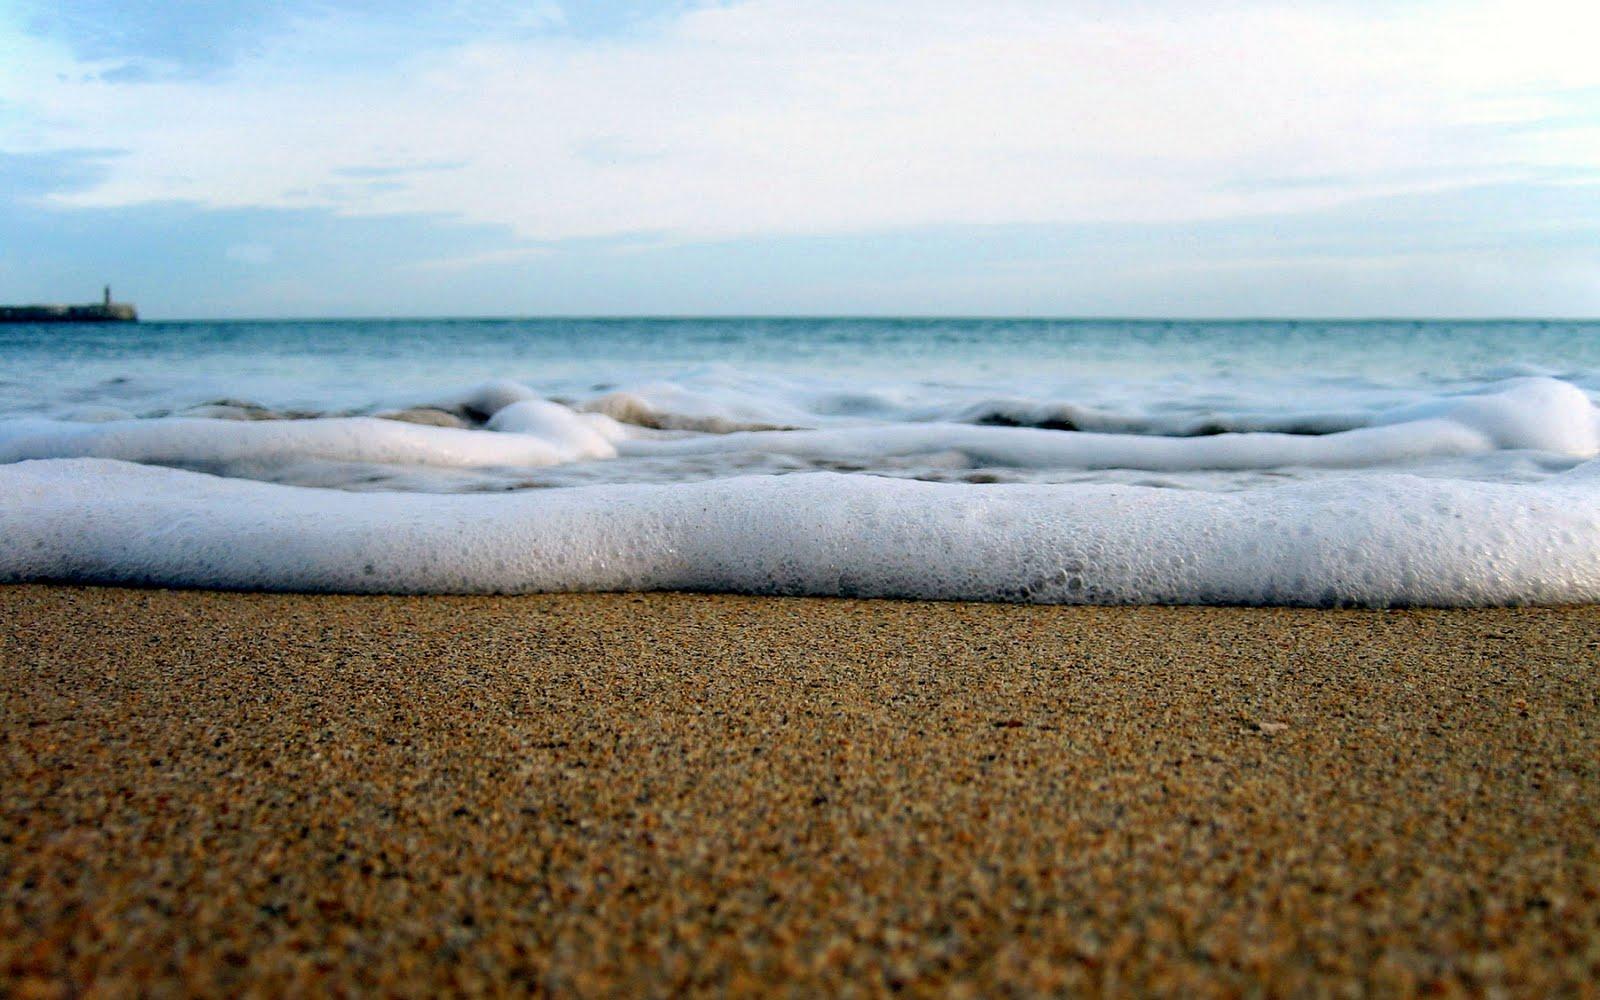 http://3.bp.blogspot.com/-EIBSuoElaeU/TssBfpnPxHI/AAAAAAAACi4/zUueAzDhfog/s1600/Beach%2BWallpaper.jpg